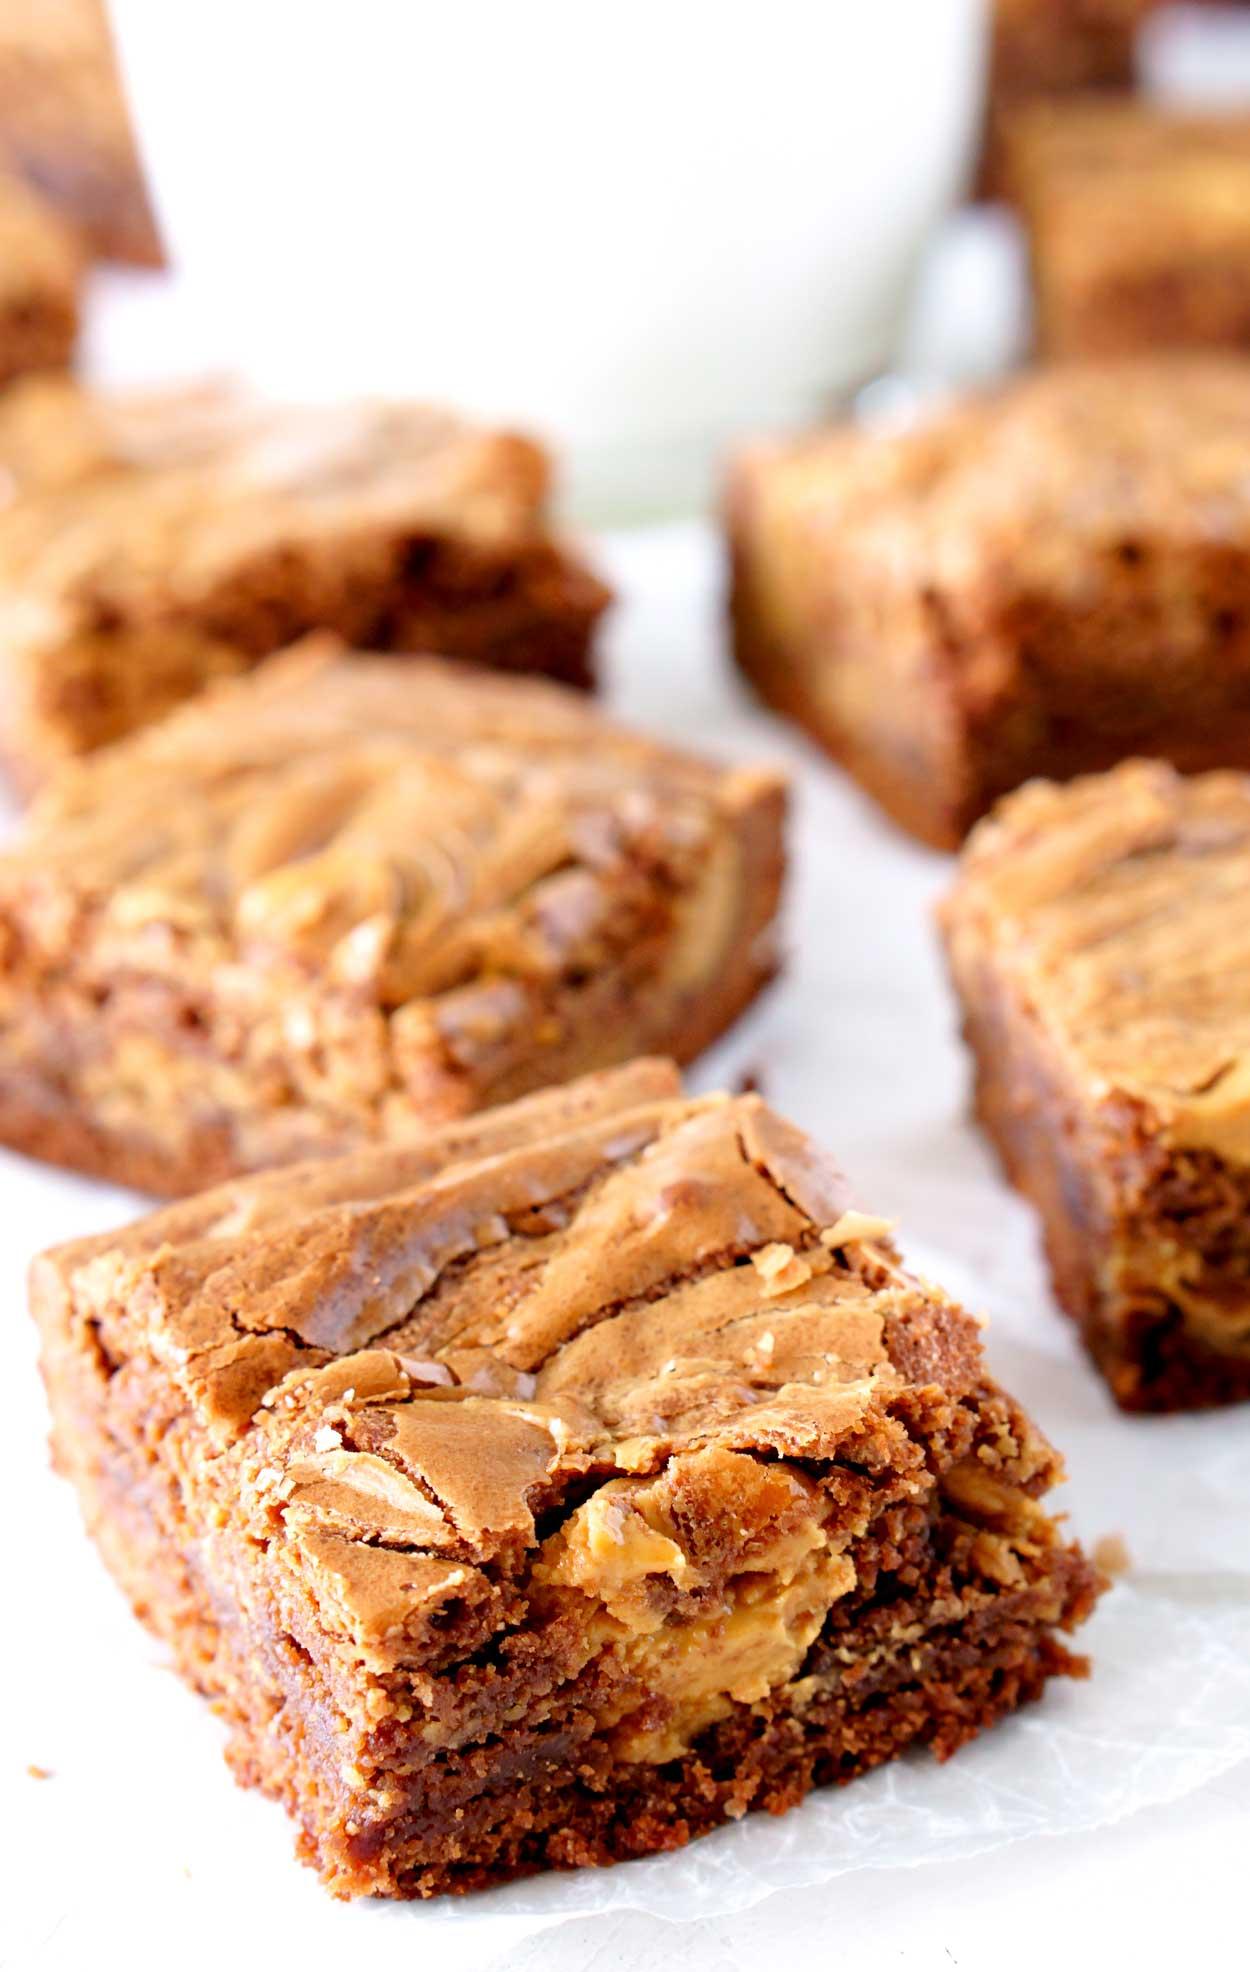 Peanut Butter Swirl Brownie Recipe • Food, Folks and Fun - photo#39